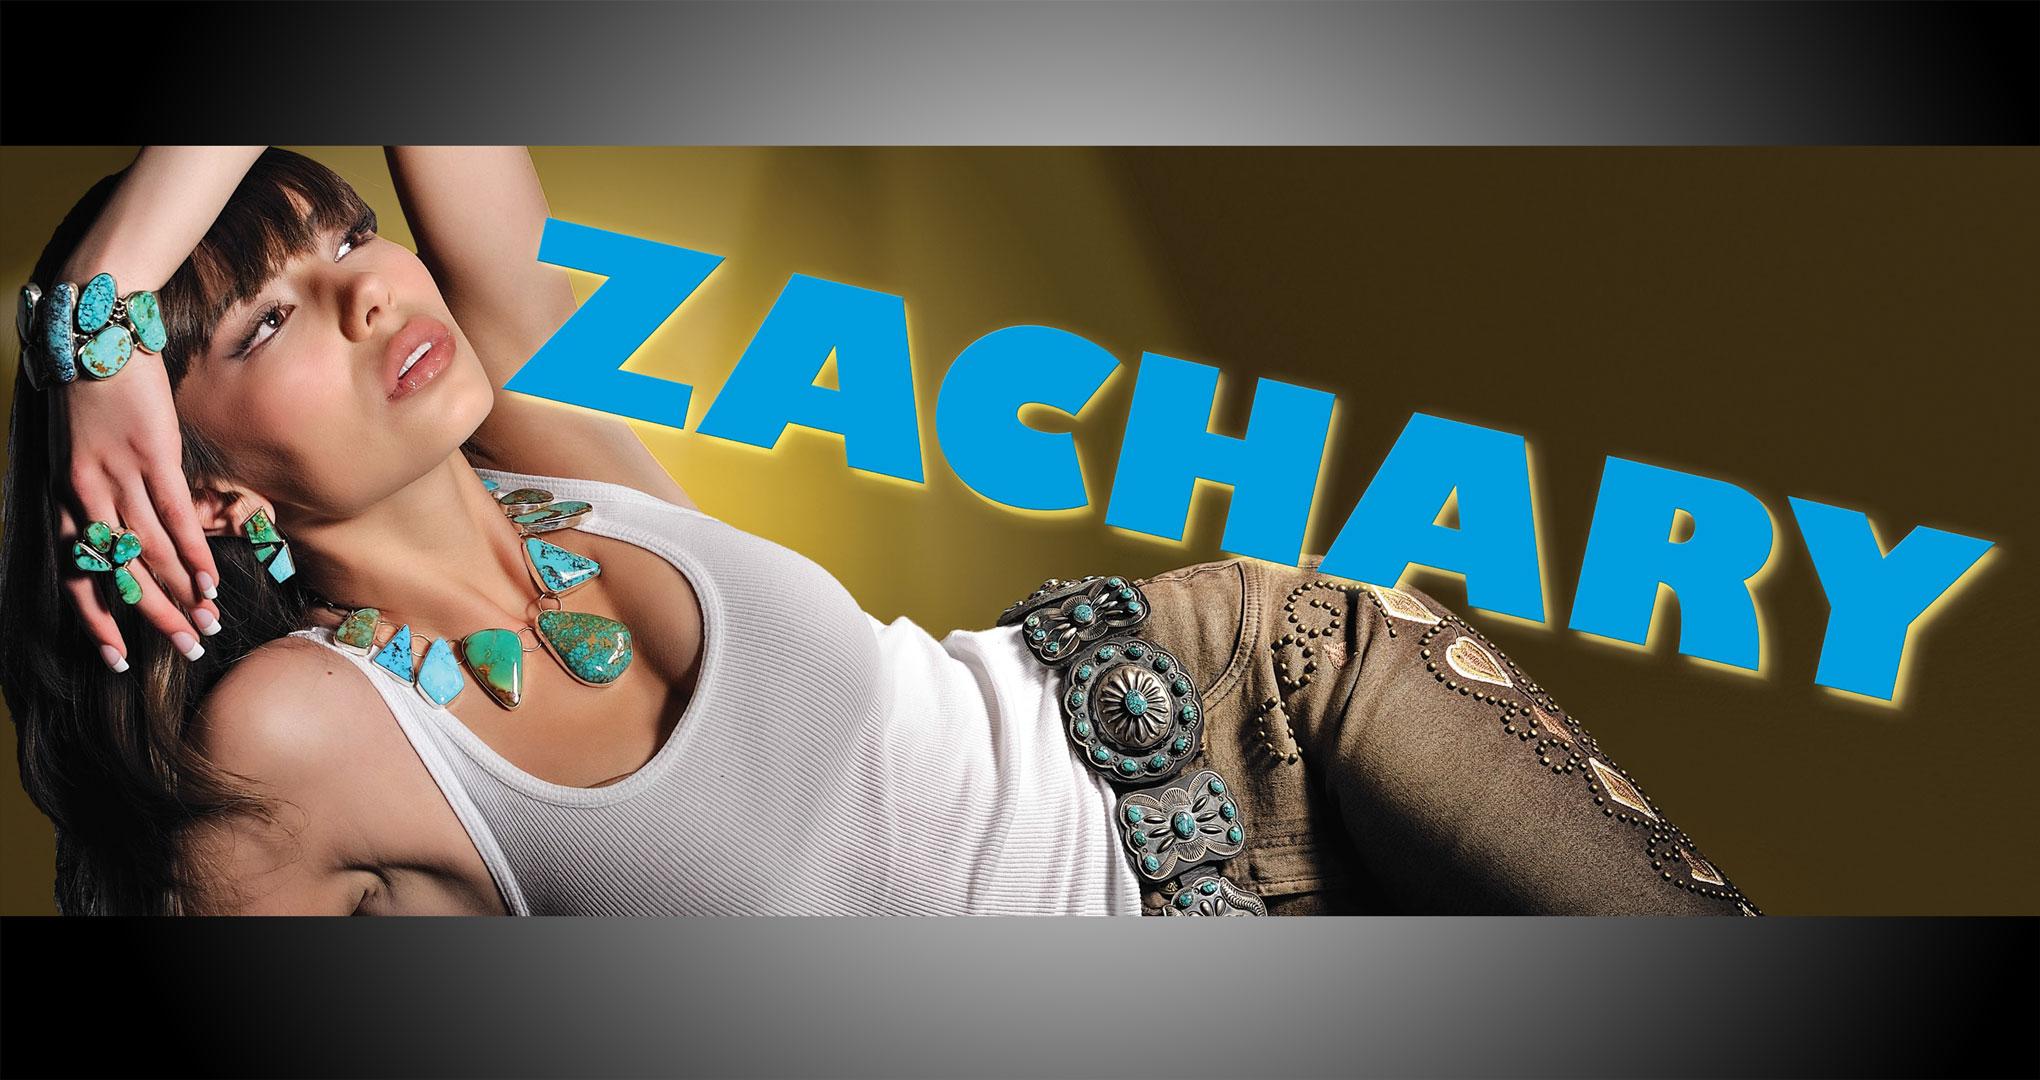 zach-five